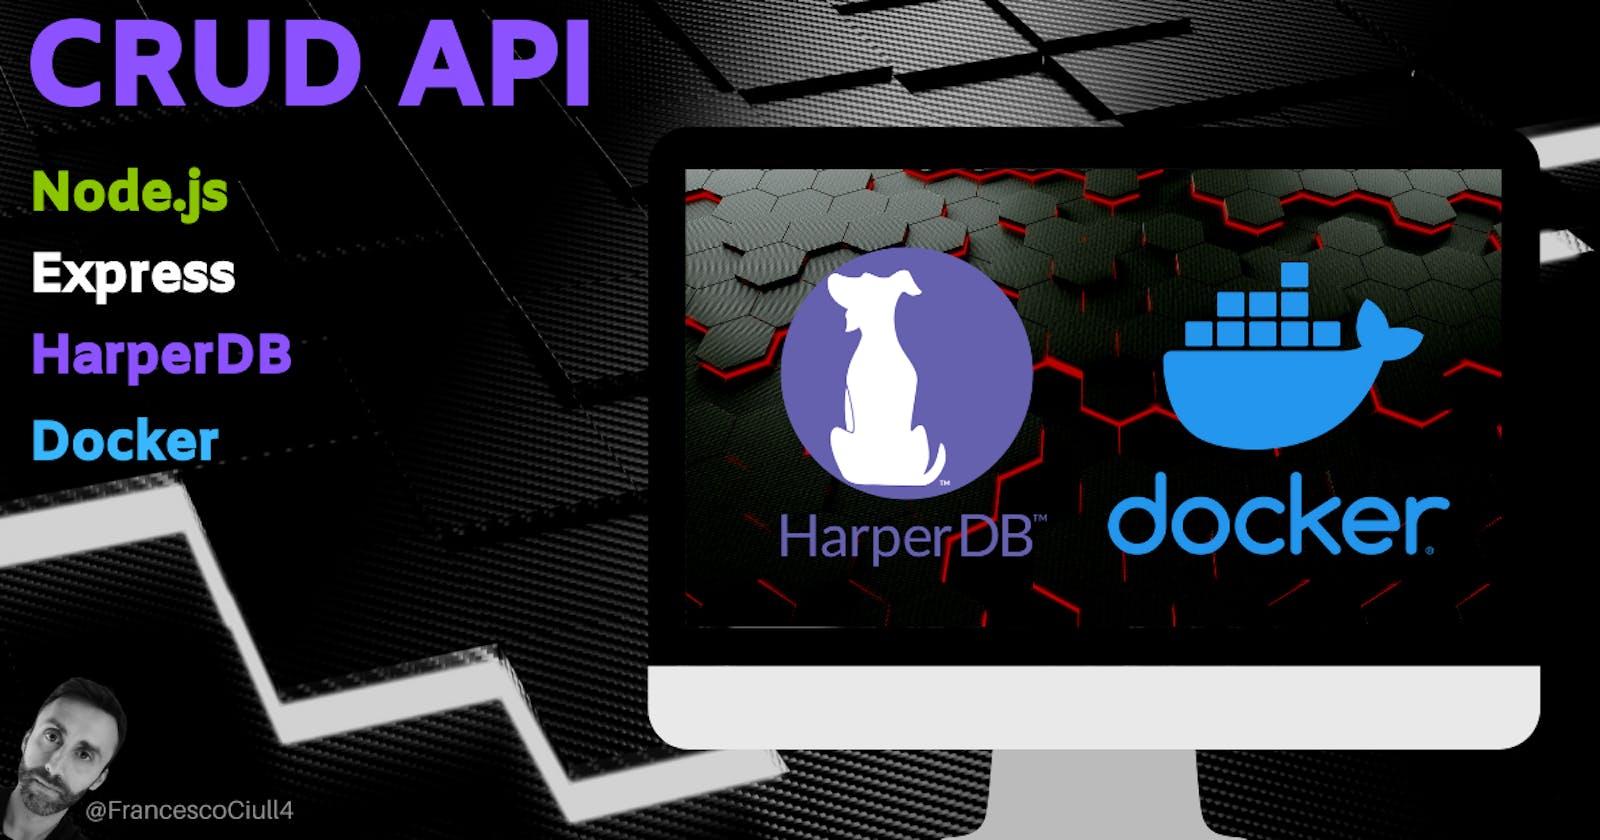 CRUD REST API using Node.js, Express, HarperDB, Docker